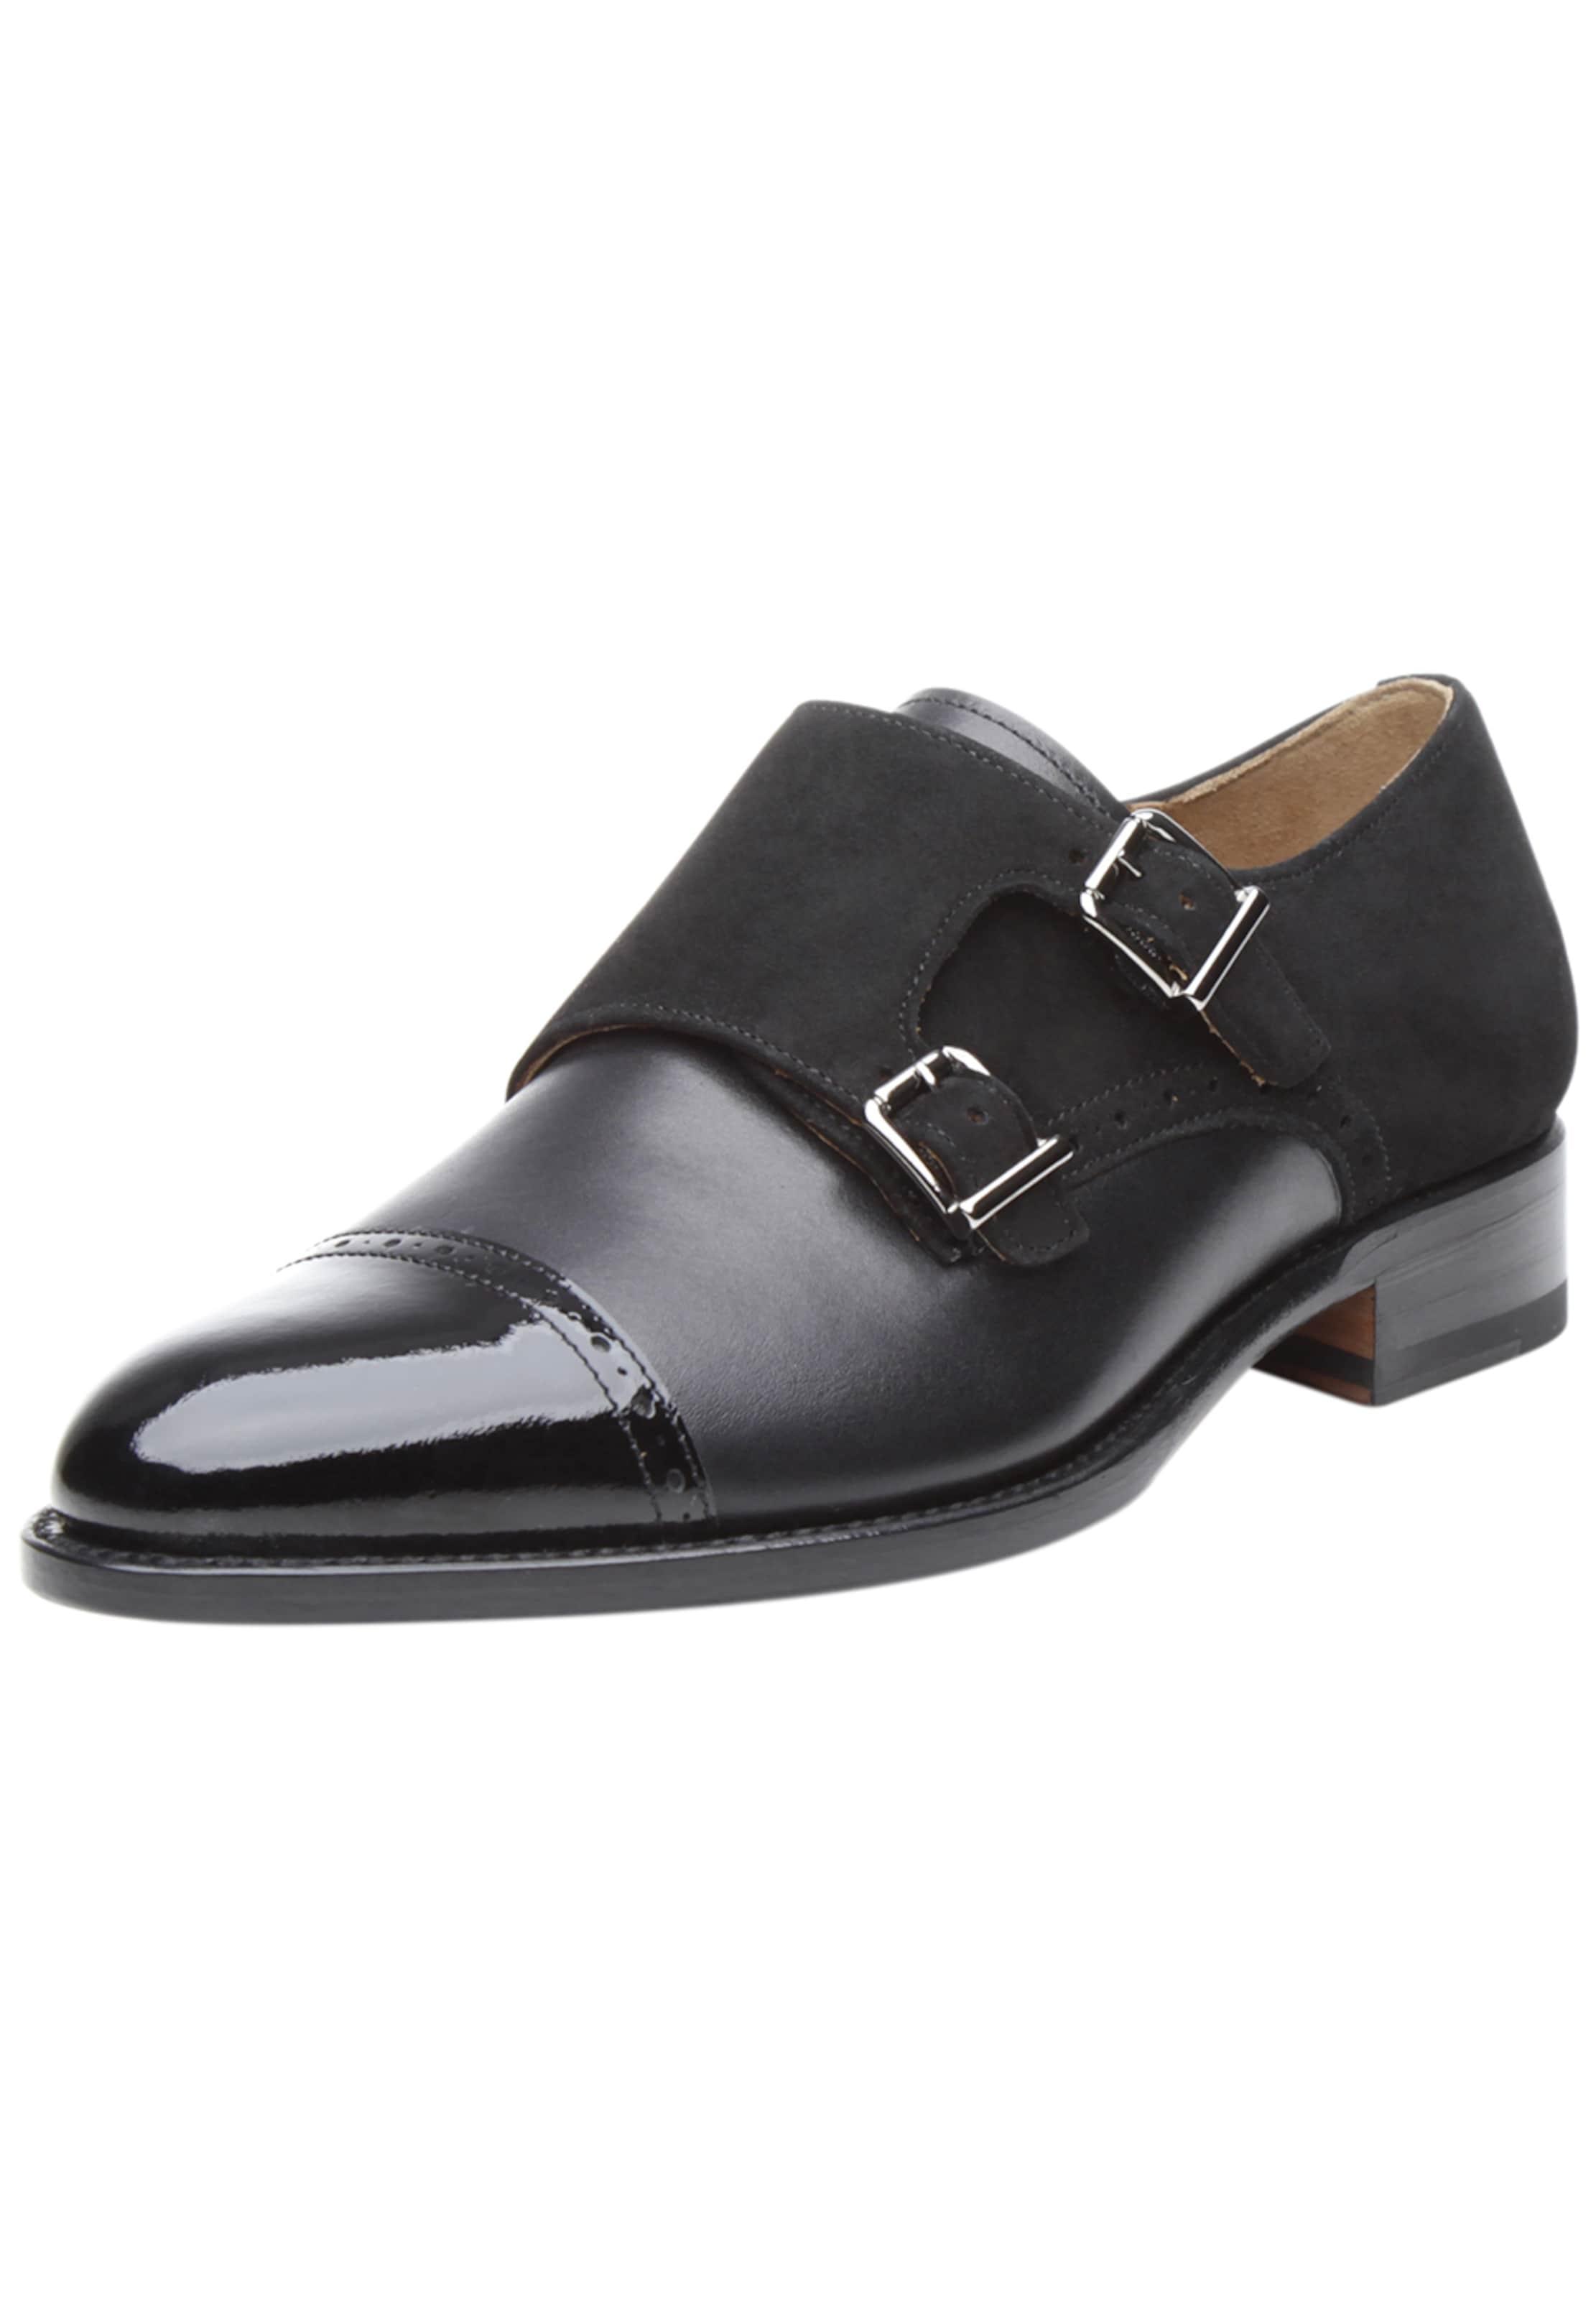 Haltbare Mode billige Schuhe SHOEPASSION | Schnallenschuhe 'No. 1109' Schuhe Gut getragene Schuhe